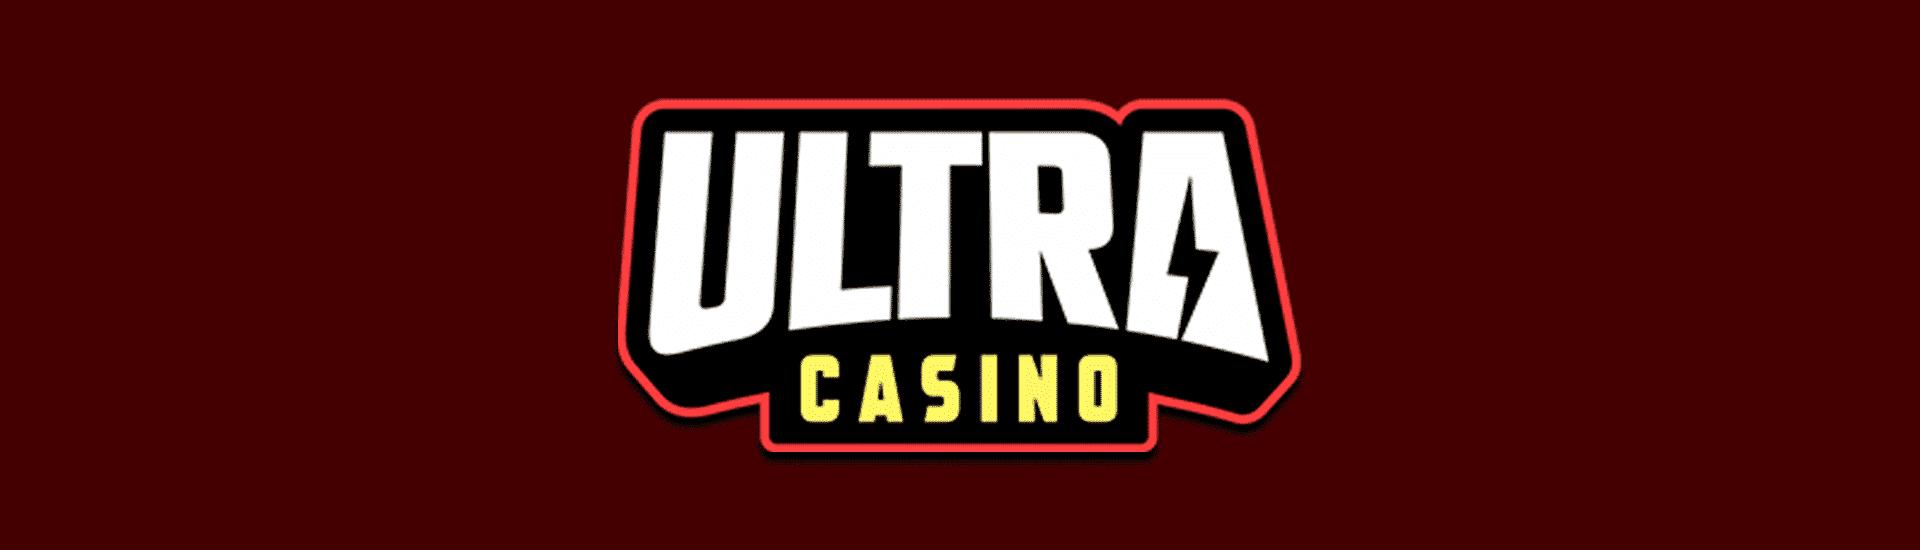 UltraCasino Featured Image